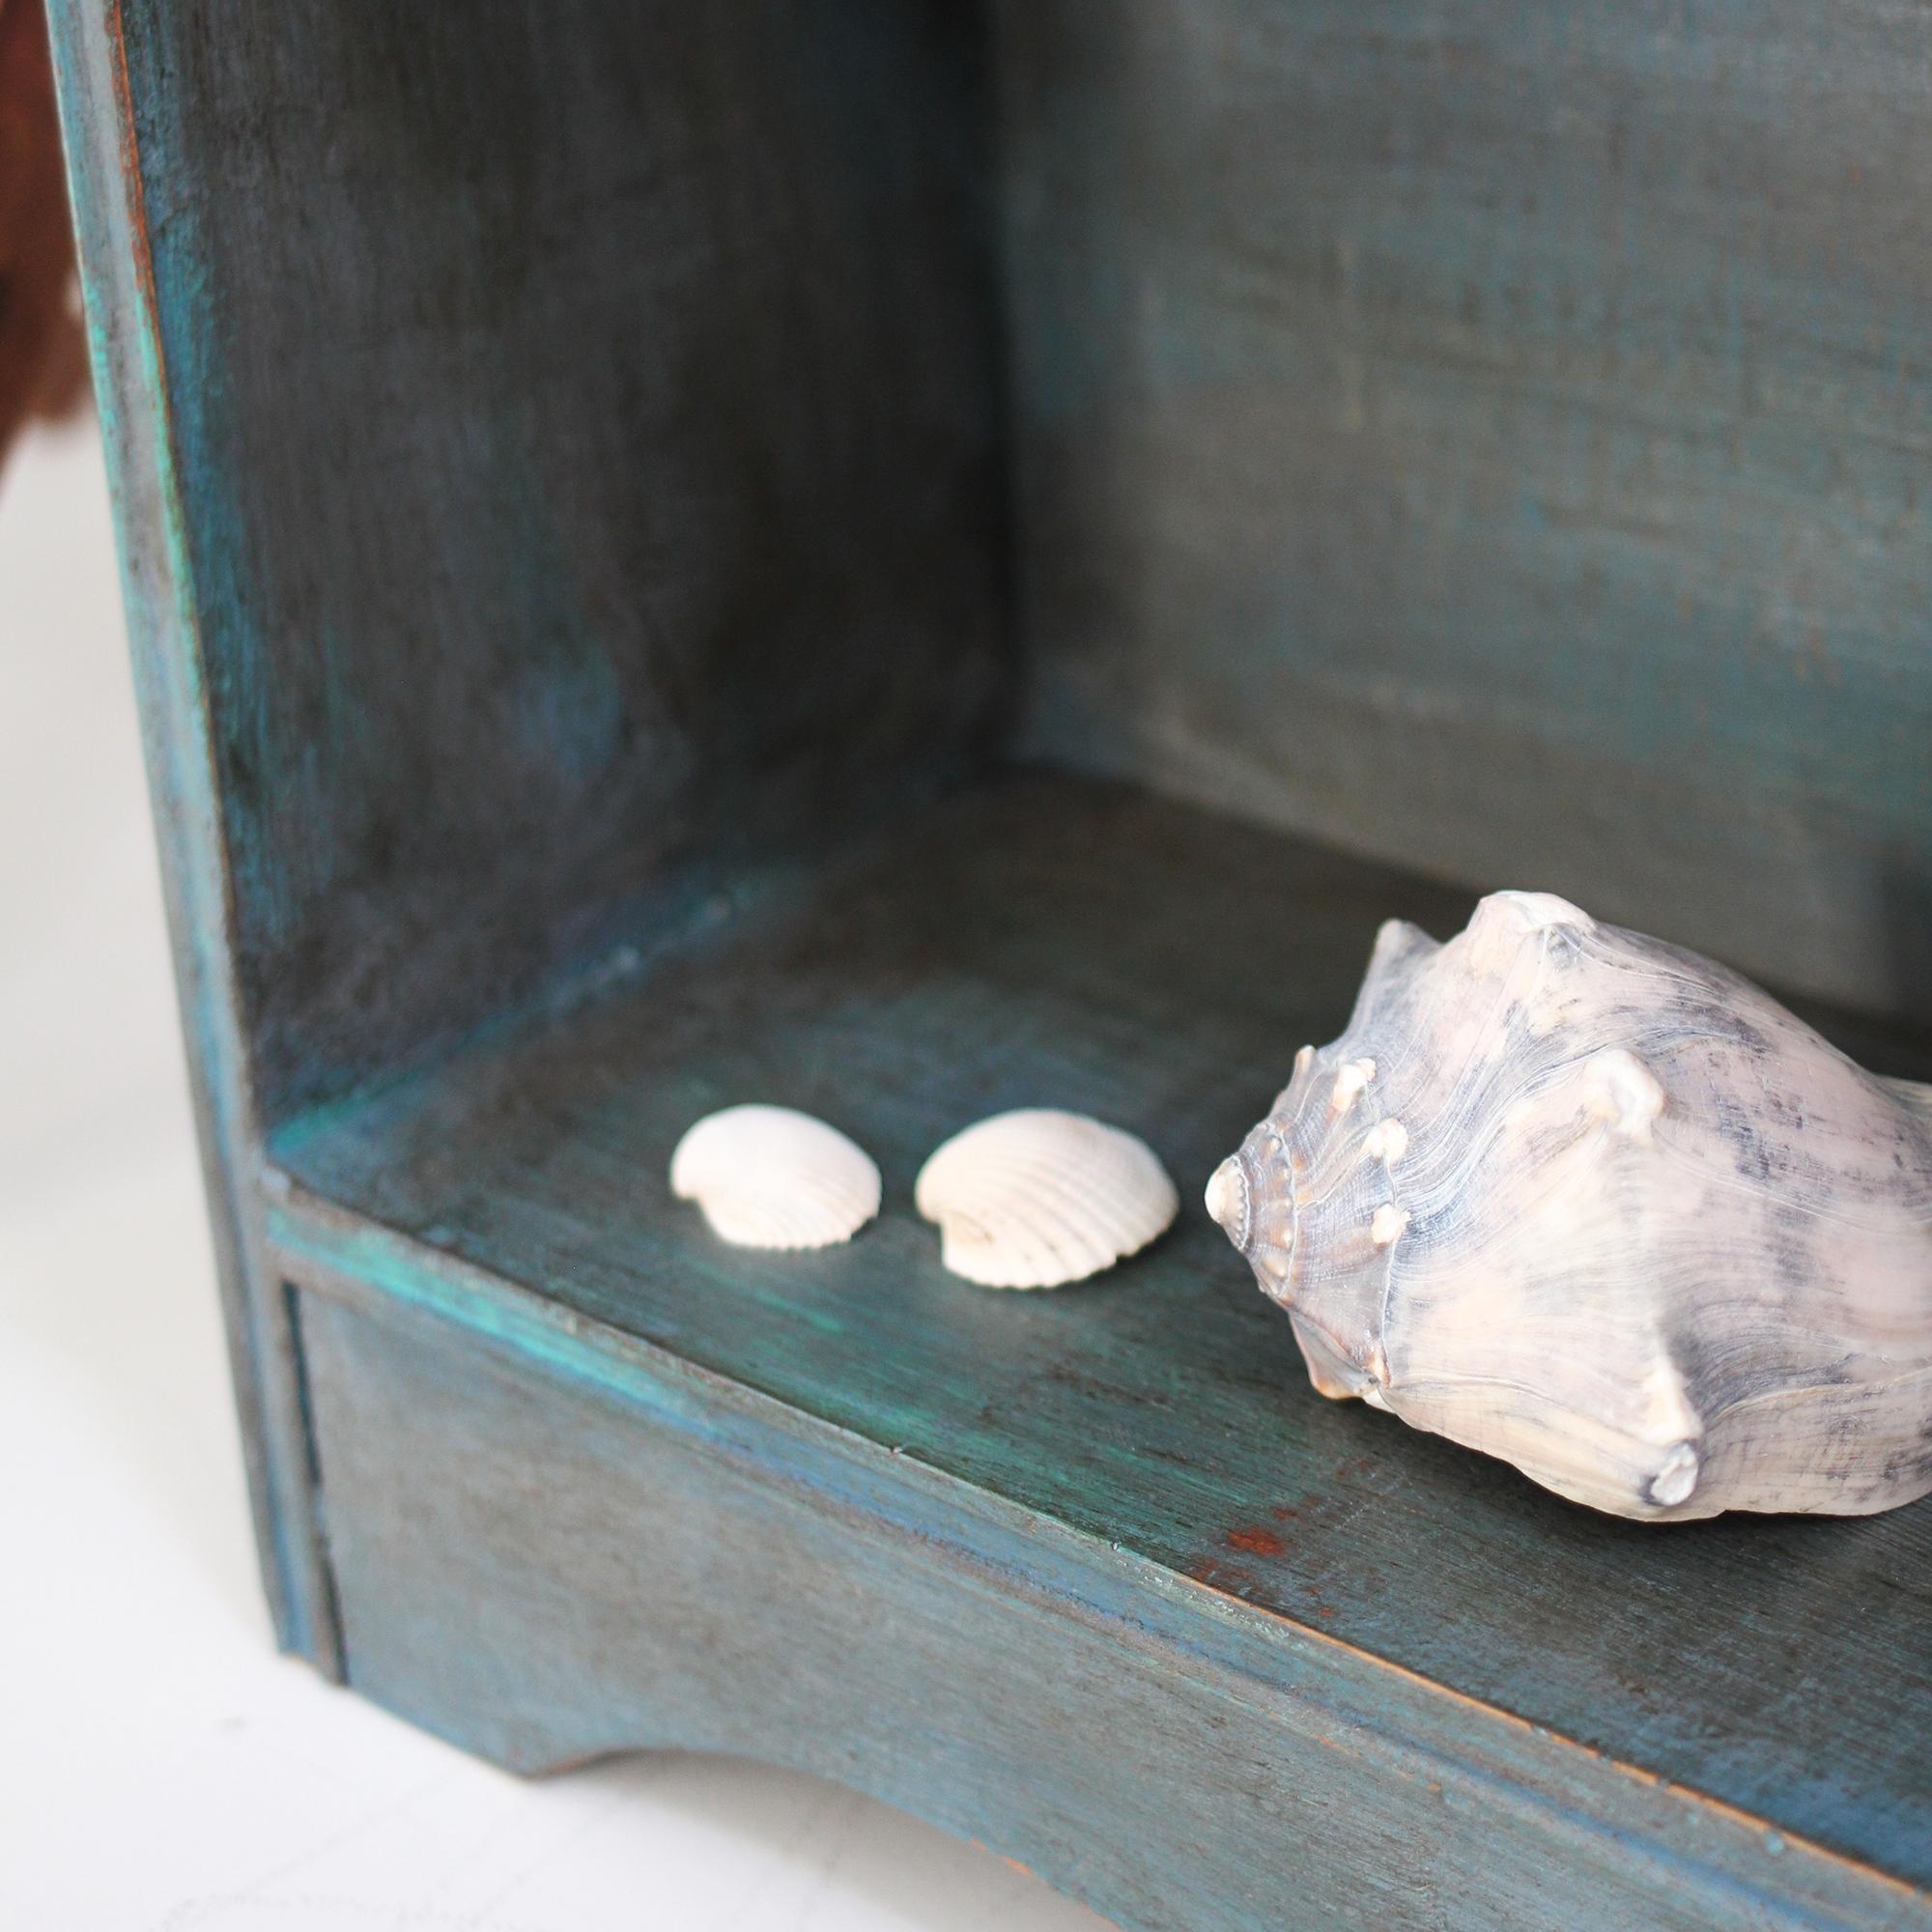 jo-torrijos-a-simpler-design-annie-sloan-chalk-paint-bookcase-atlanta-painted-furniture-10.jpg